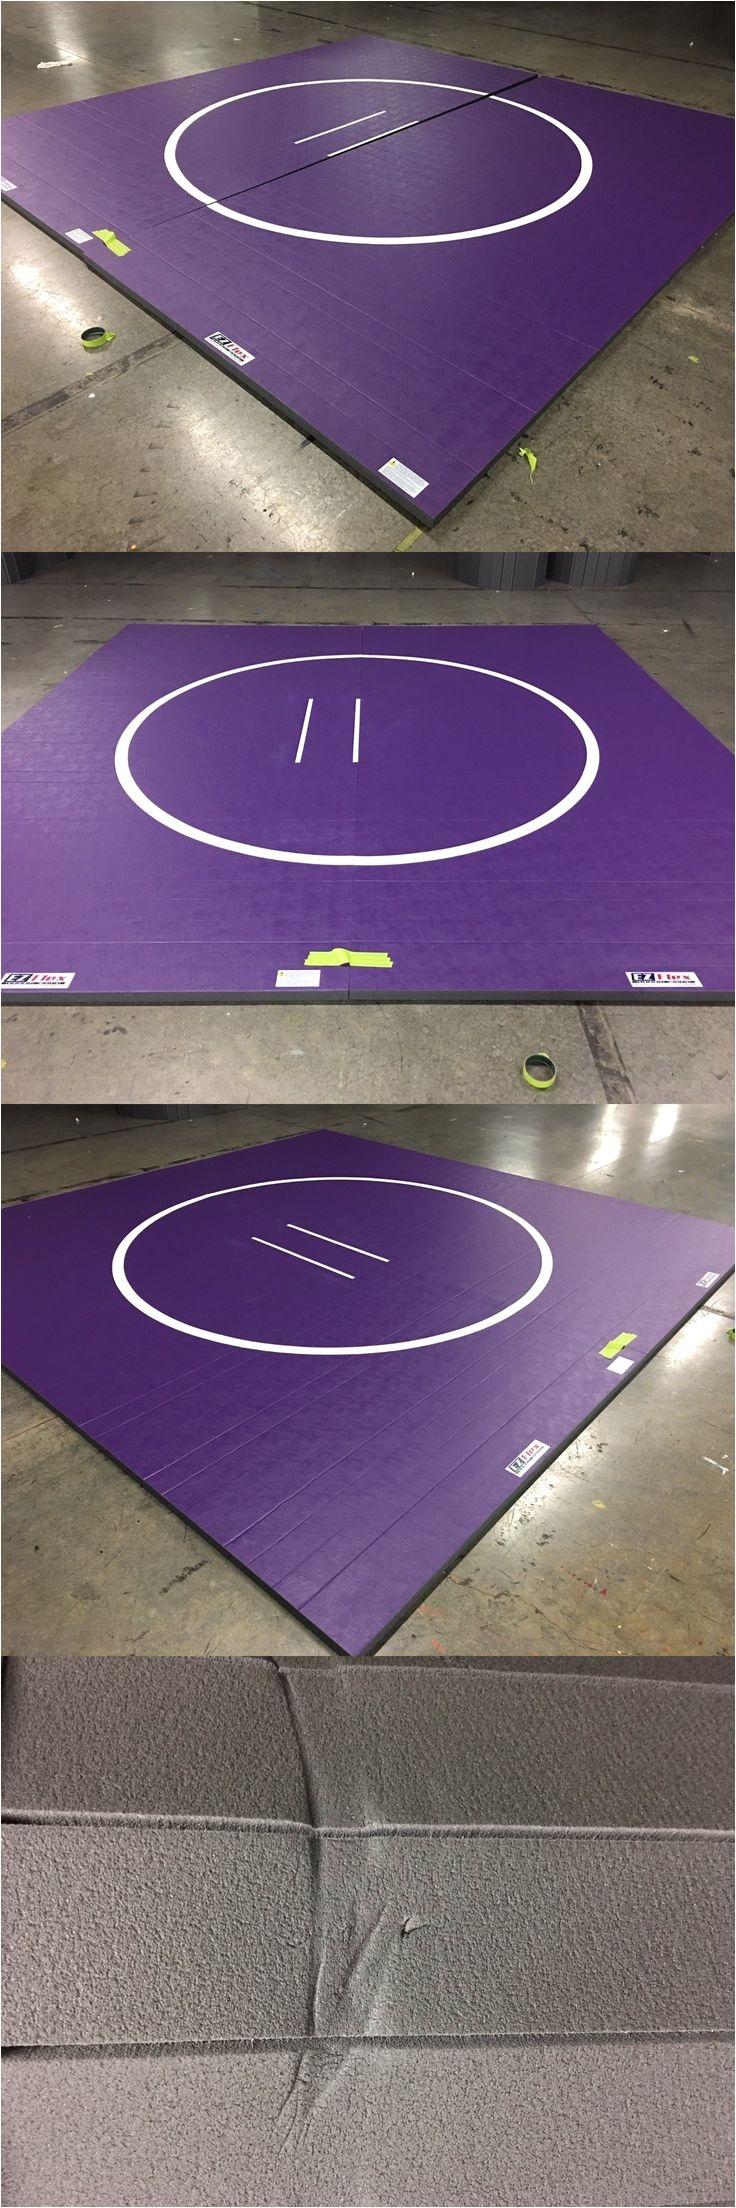 floor mats and pads 179788 ez flex 12 x12 x1 5 8 purple wrestling